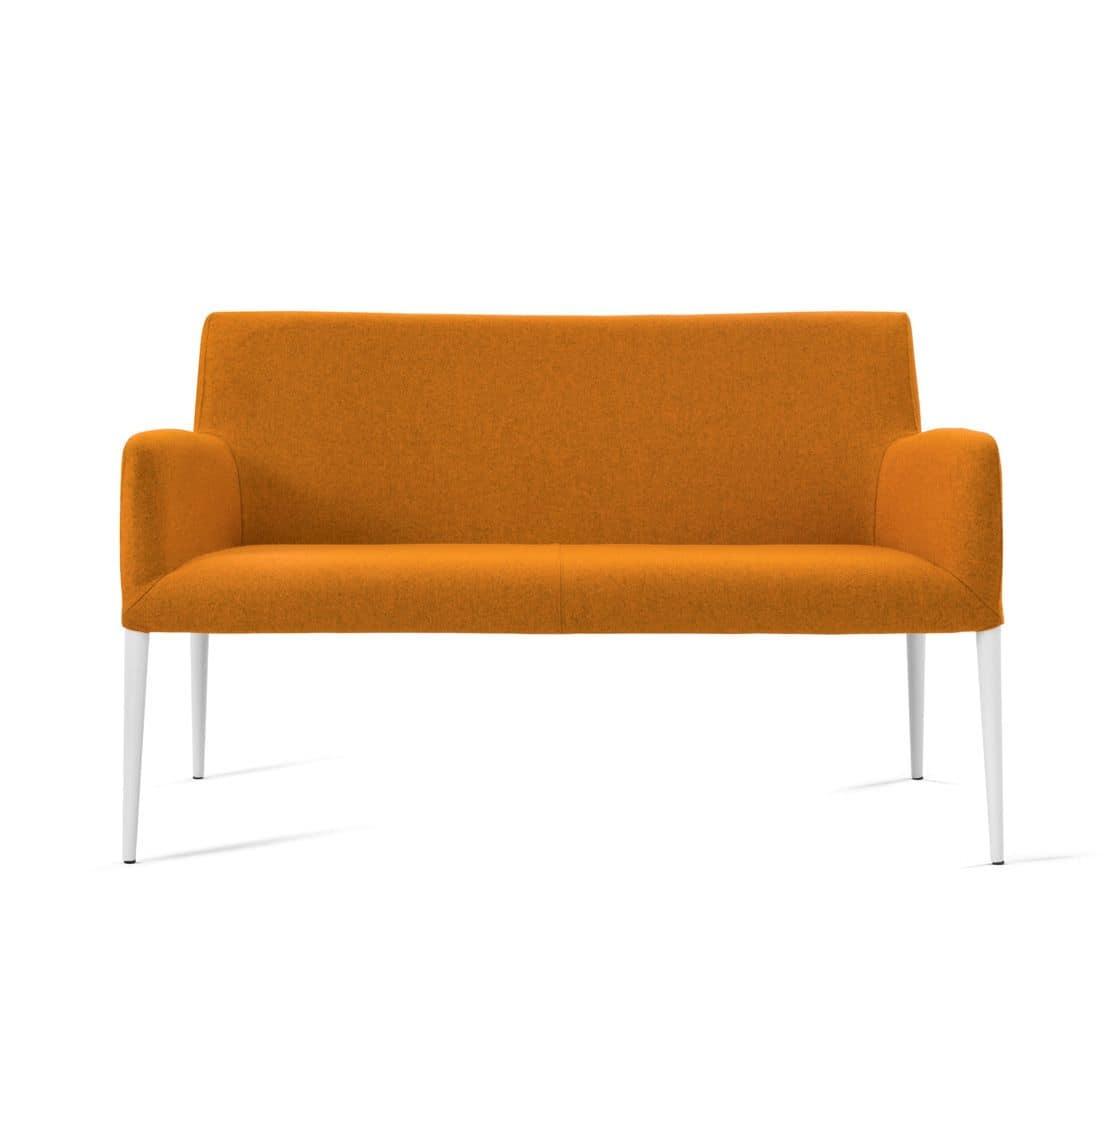 2 sitzer sofa lederbezug beine aus metall idfdesign. Black Bedroom Furniture Sets. Home Design Ideas